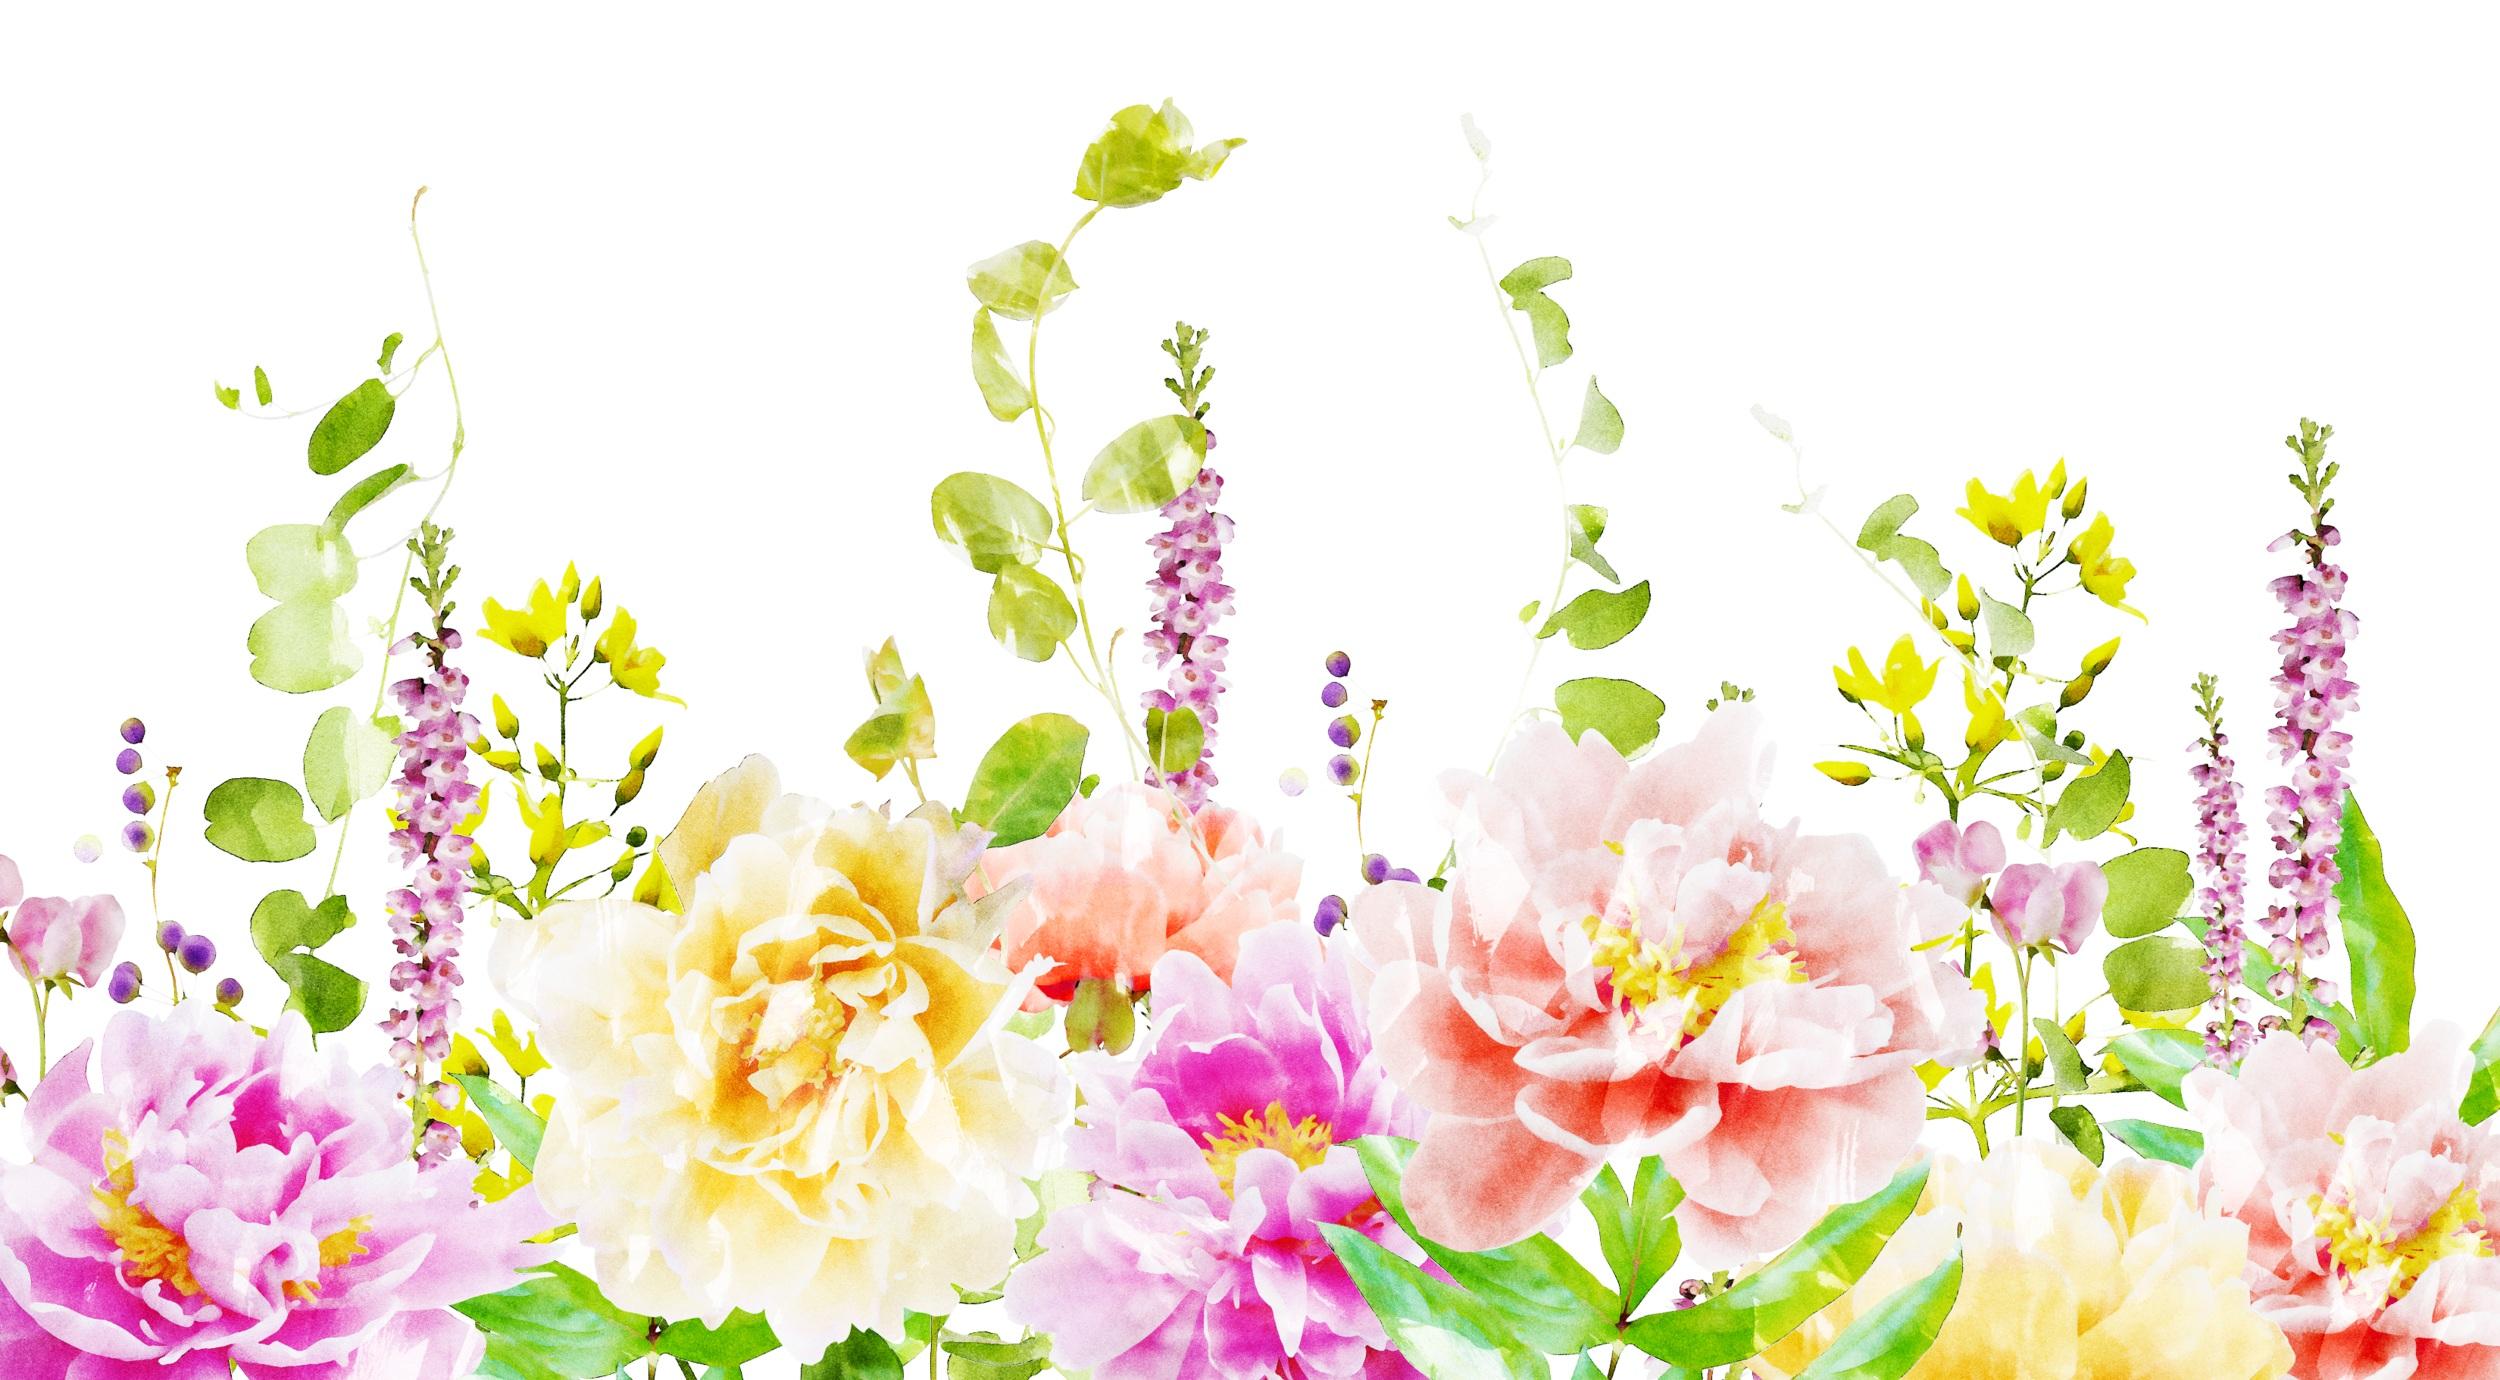 FloralDrop_3.jpg